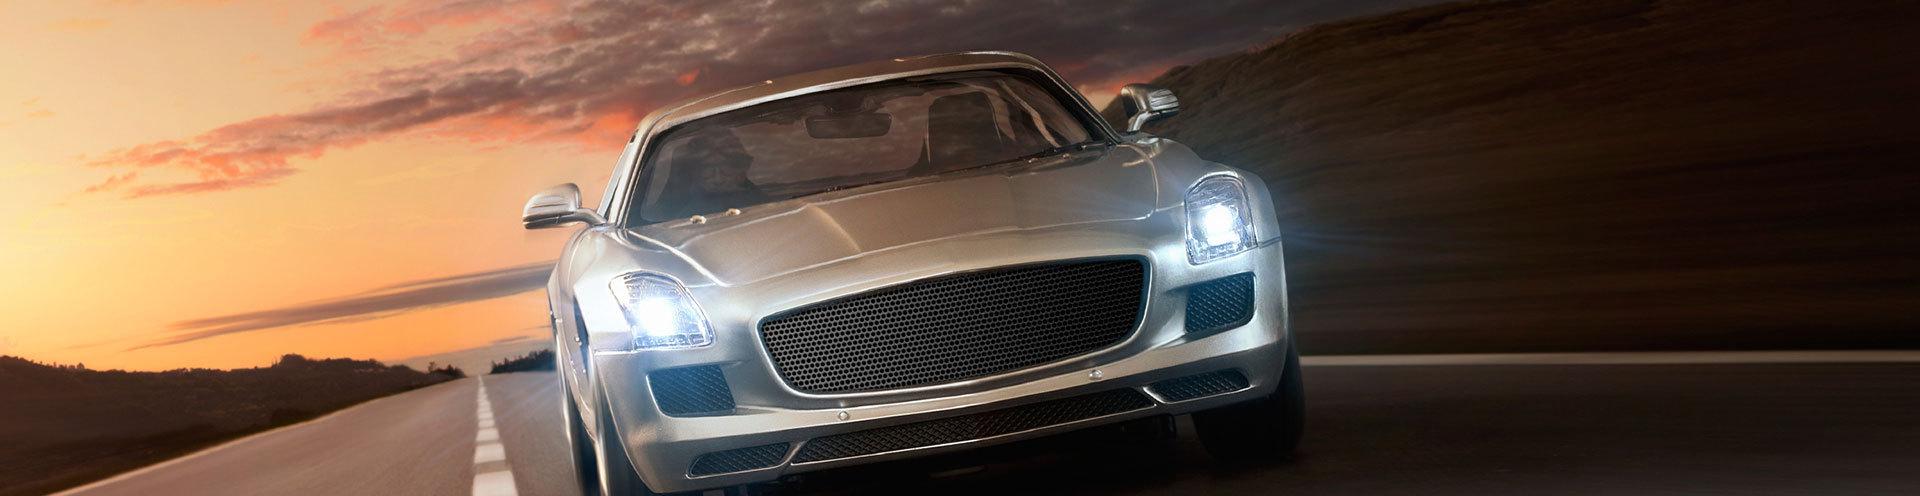 Nationwide Car Sales | Banner 1